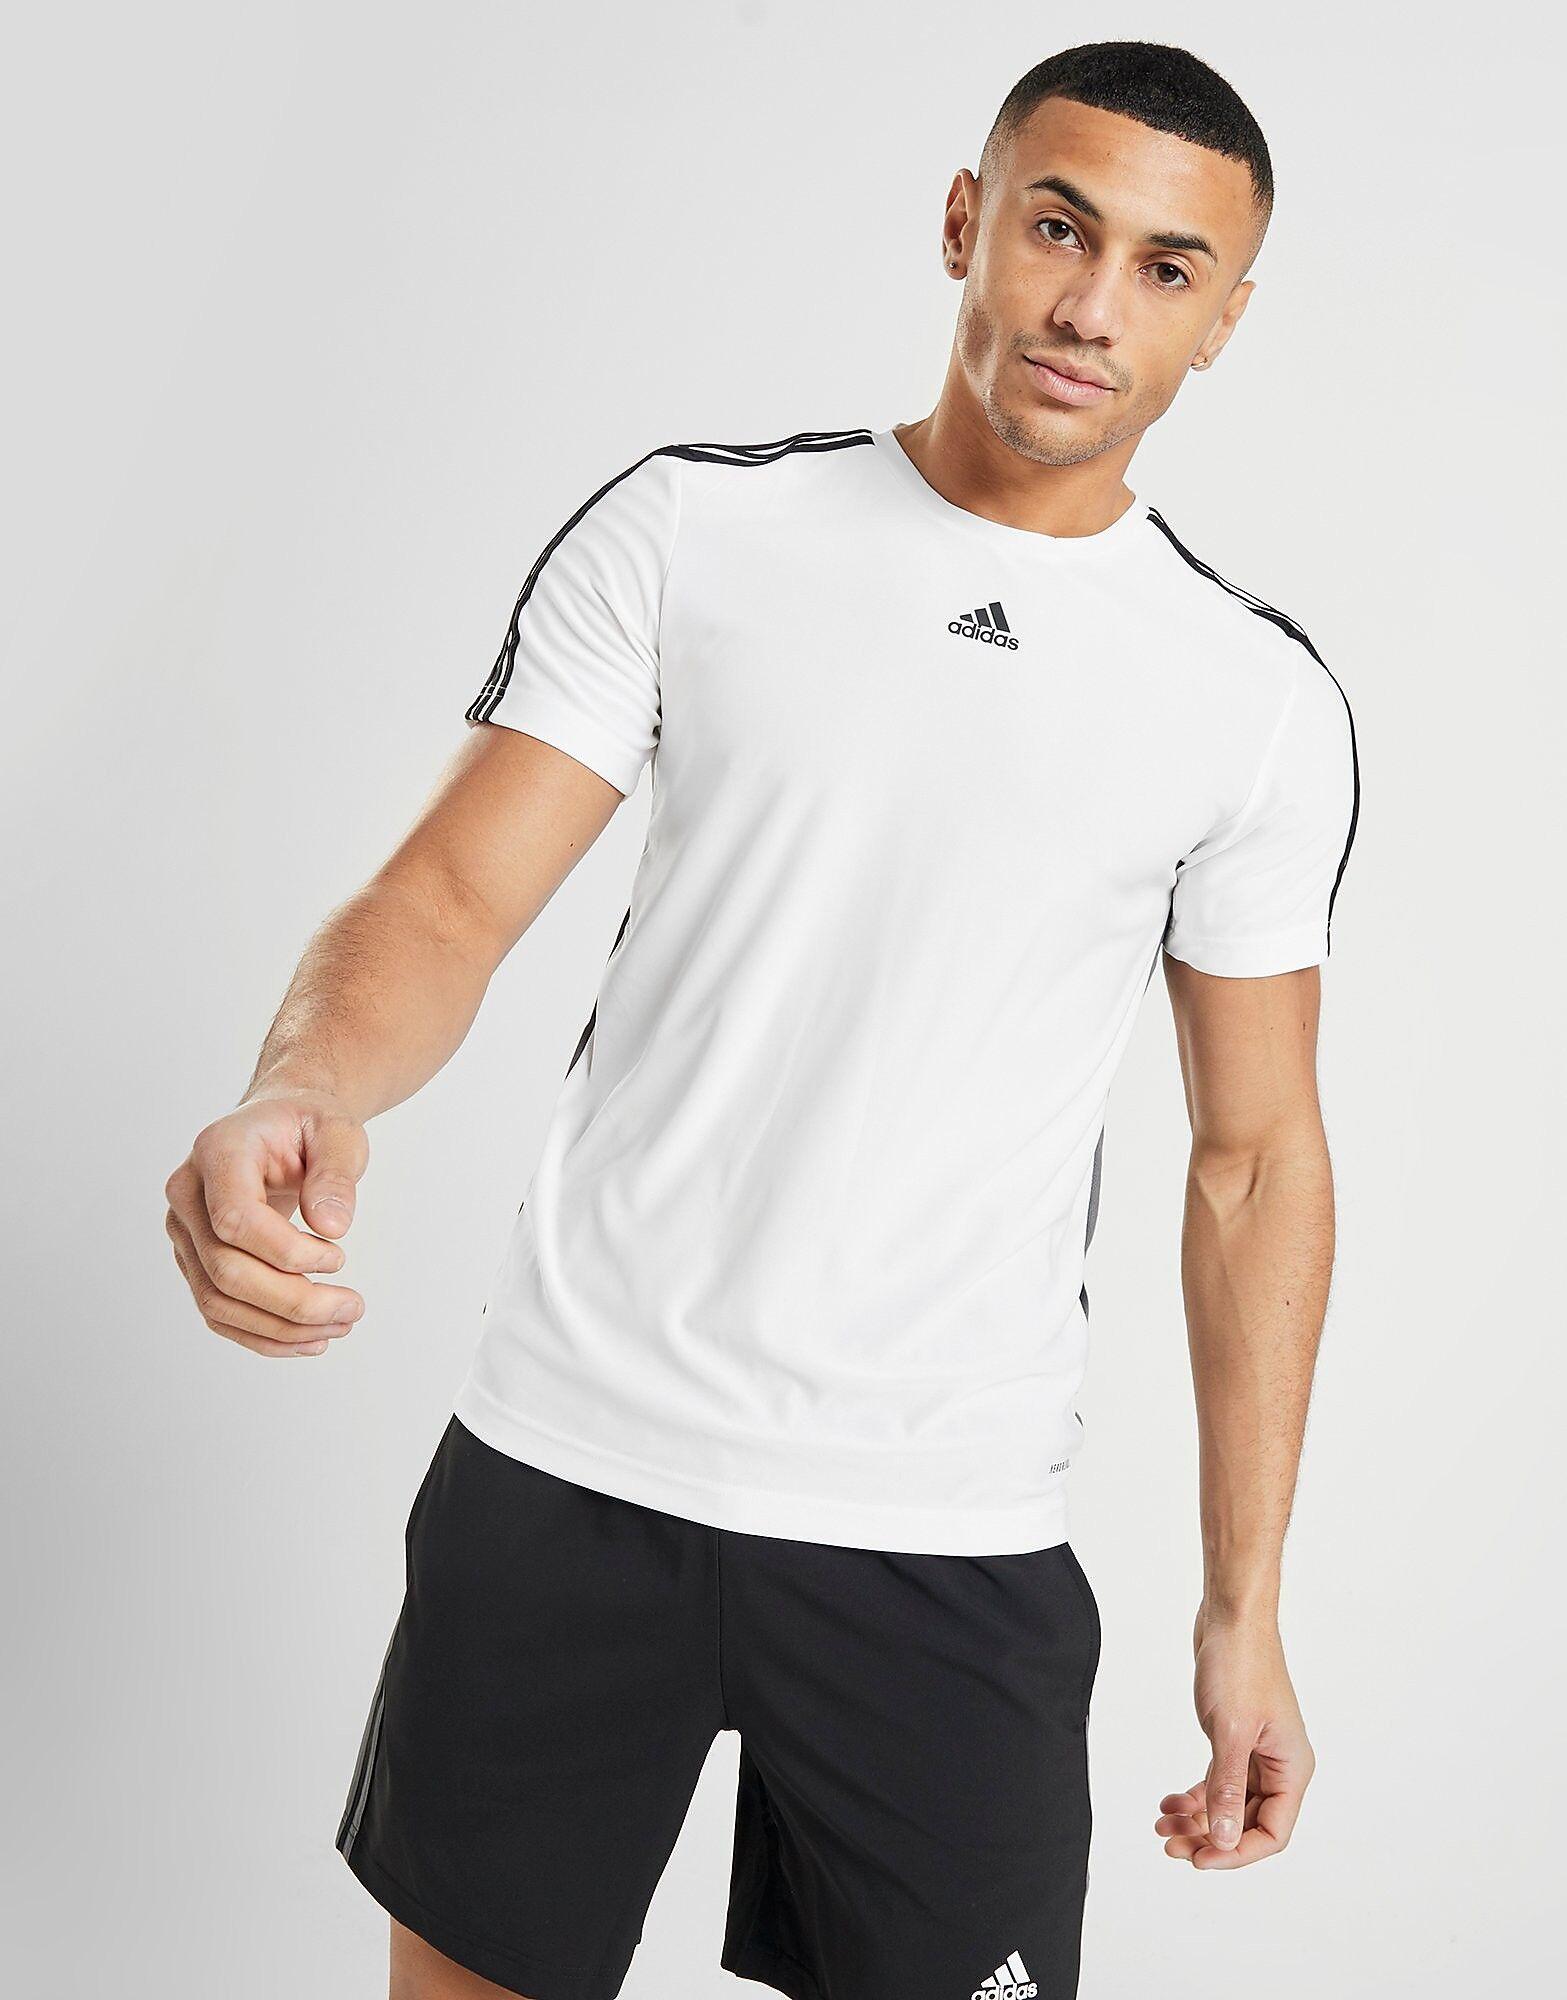 Image of Adidas Match T-paita Miehet - Only at JD - Mens, Valkoinen